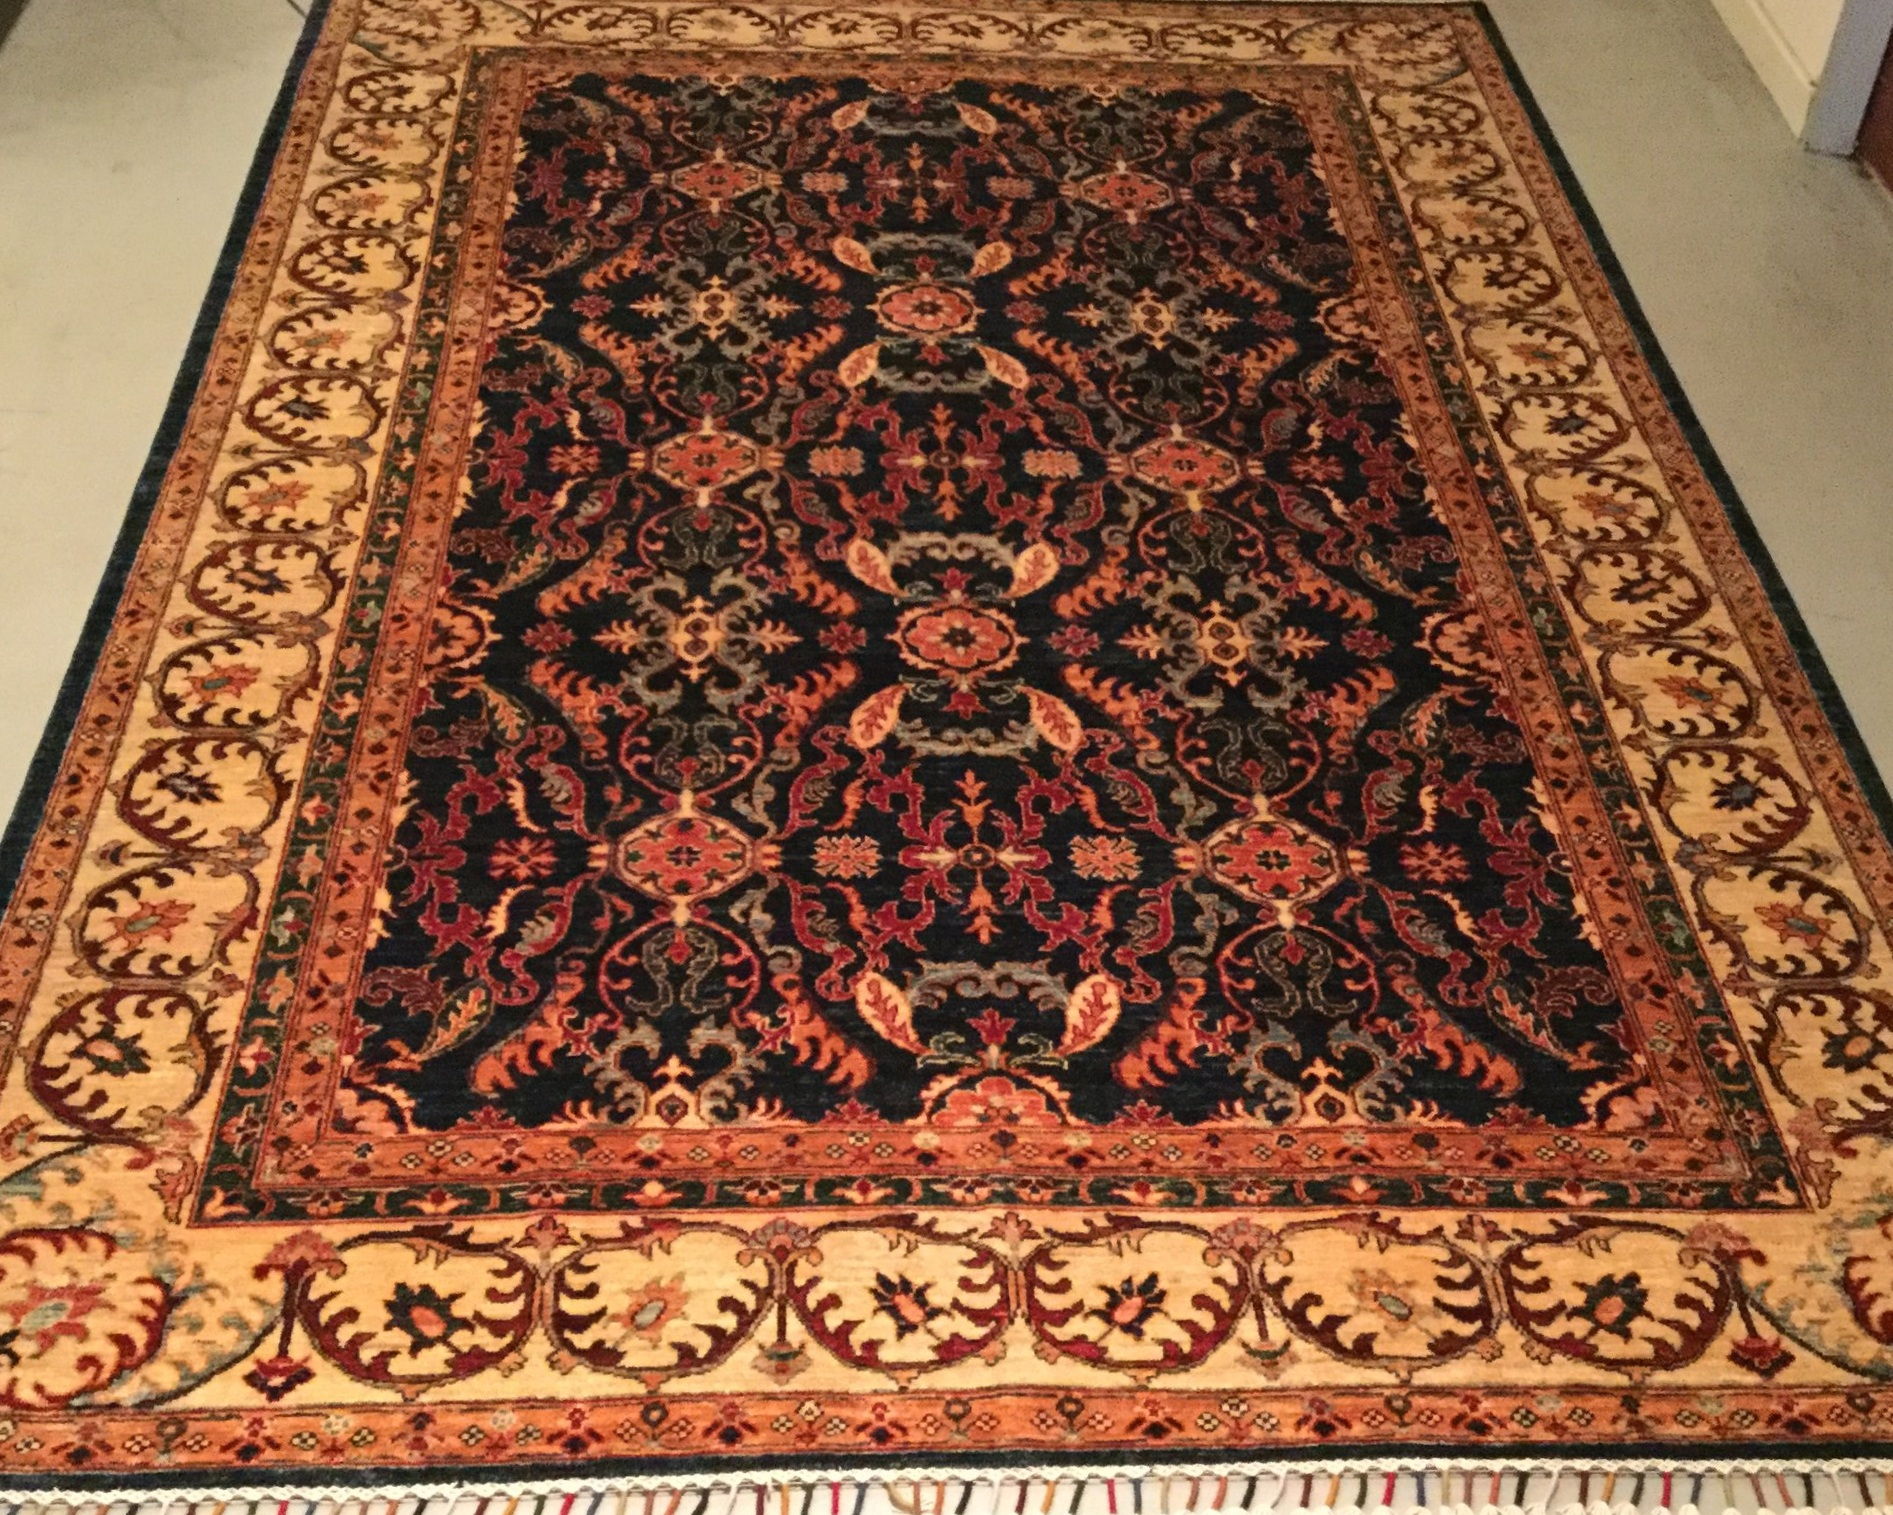 Afghan Zieglar - Circa 2000'sSize Measurements: 294cm x 210cm